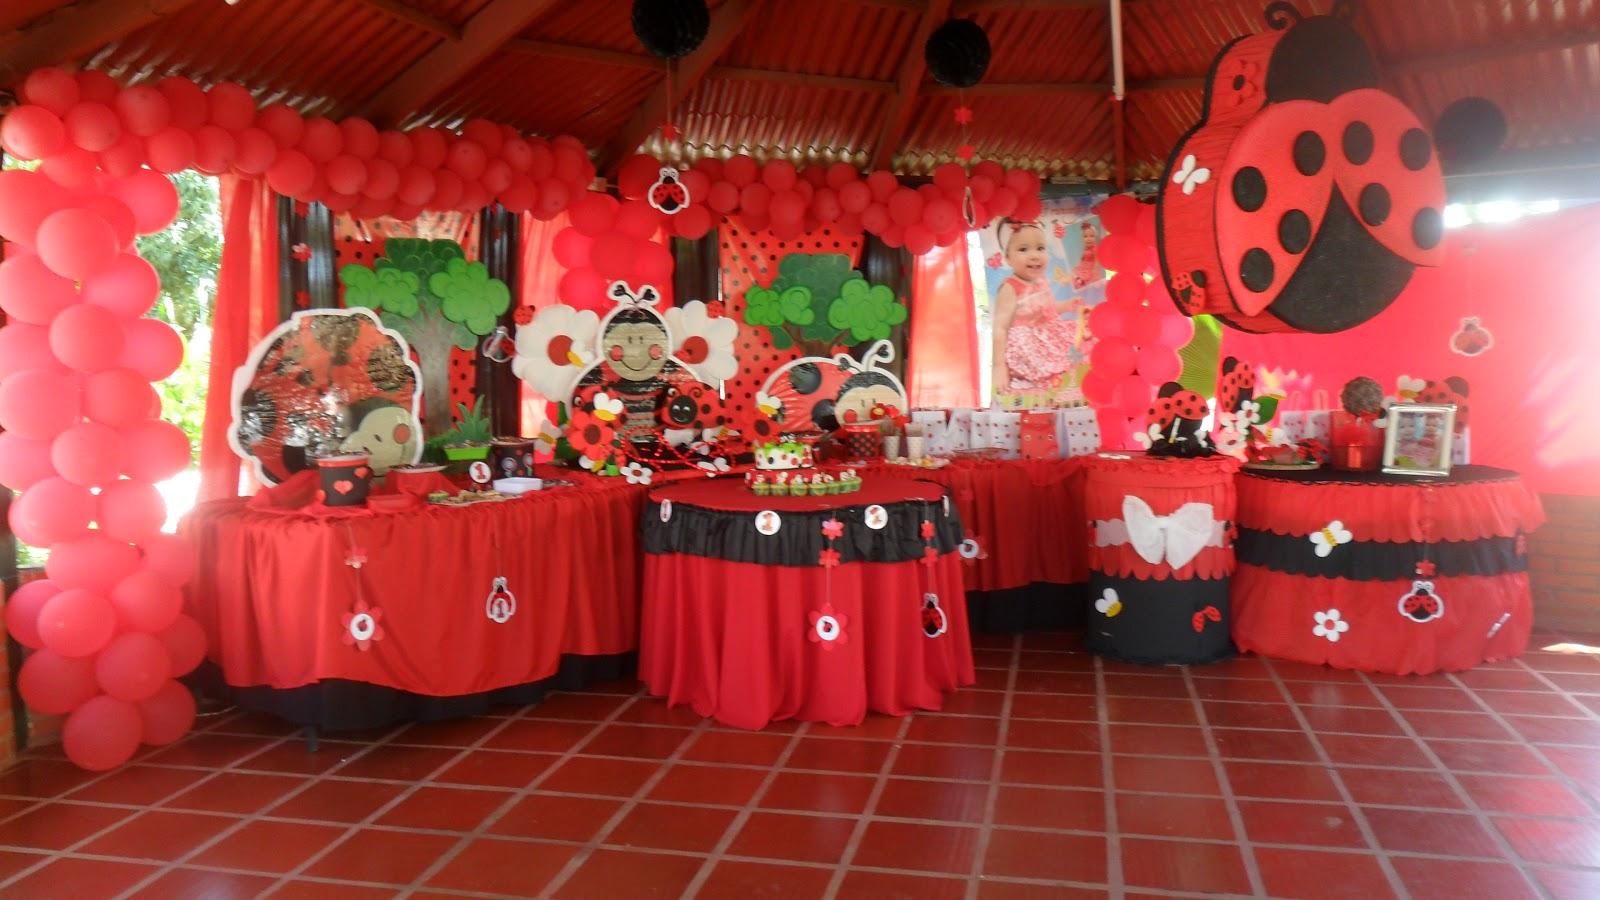 Decoracion de fiestas mariquitas imagui for Decoracion de adornos